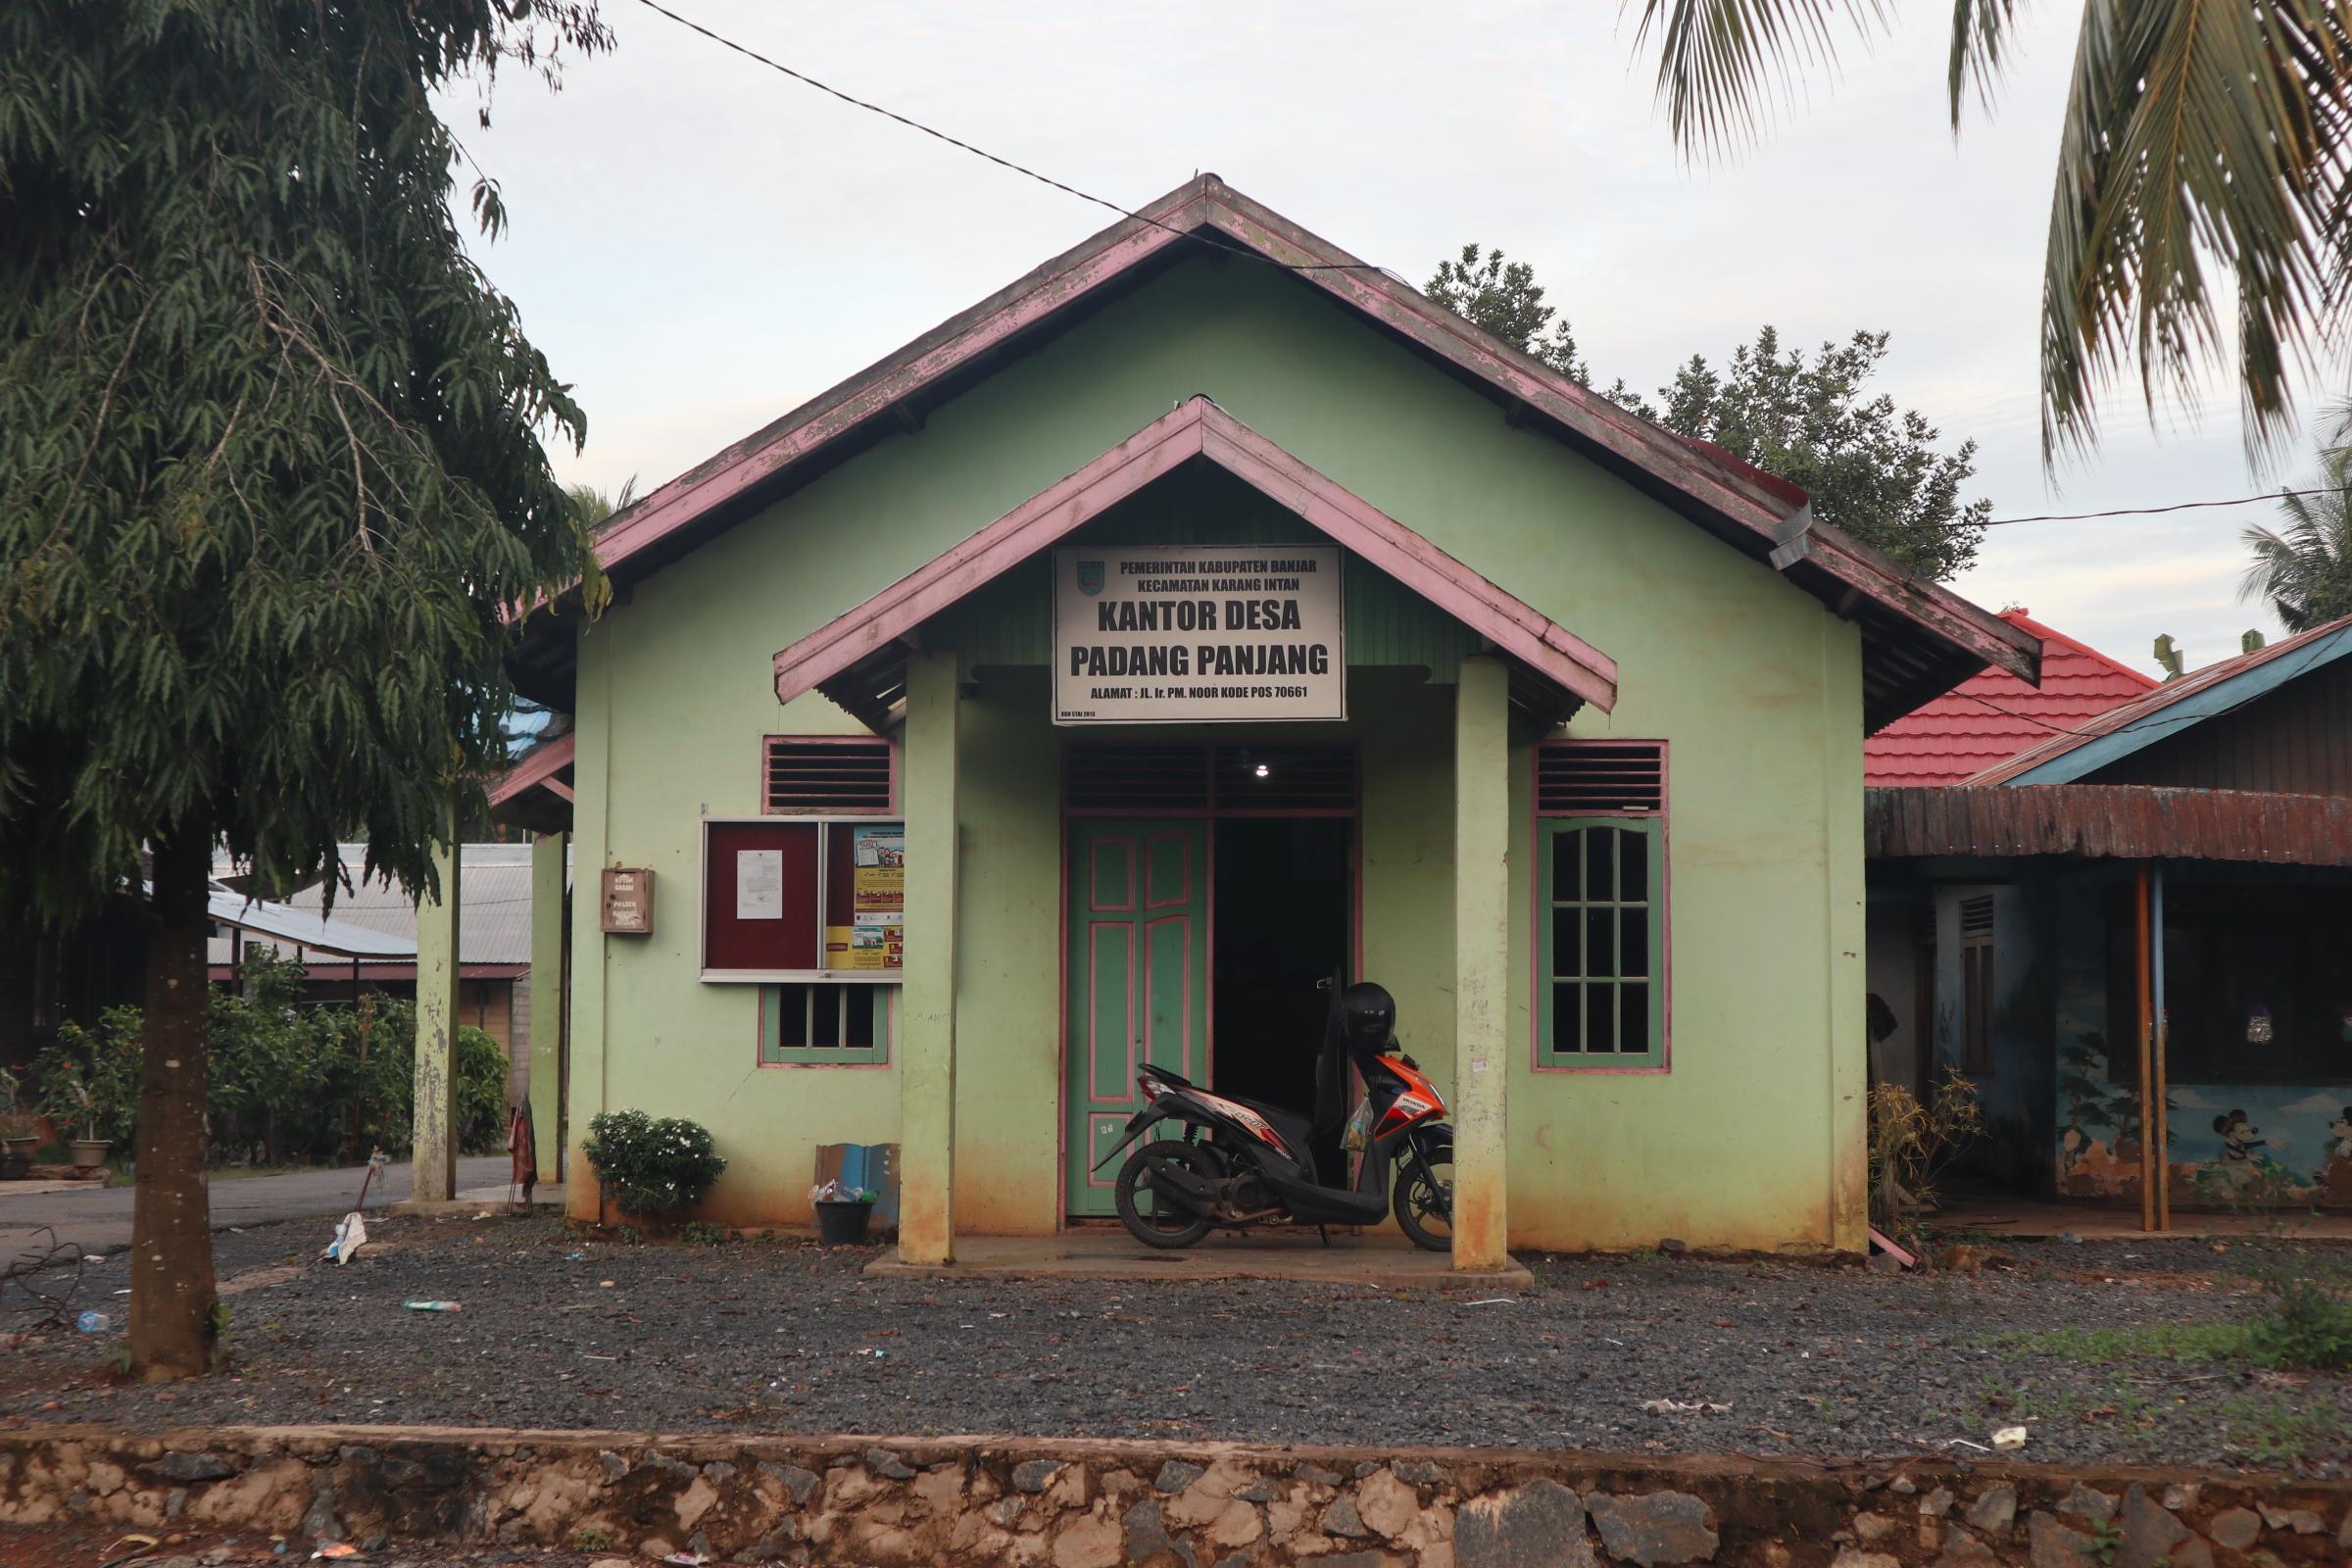 Padang Panjang Karang Intan Banjar Wikipedia Bahasa Indonesia Ensiklopedia Bebas